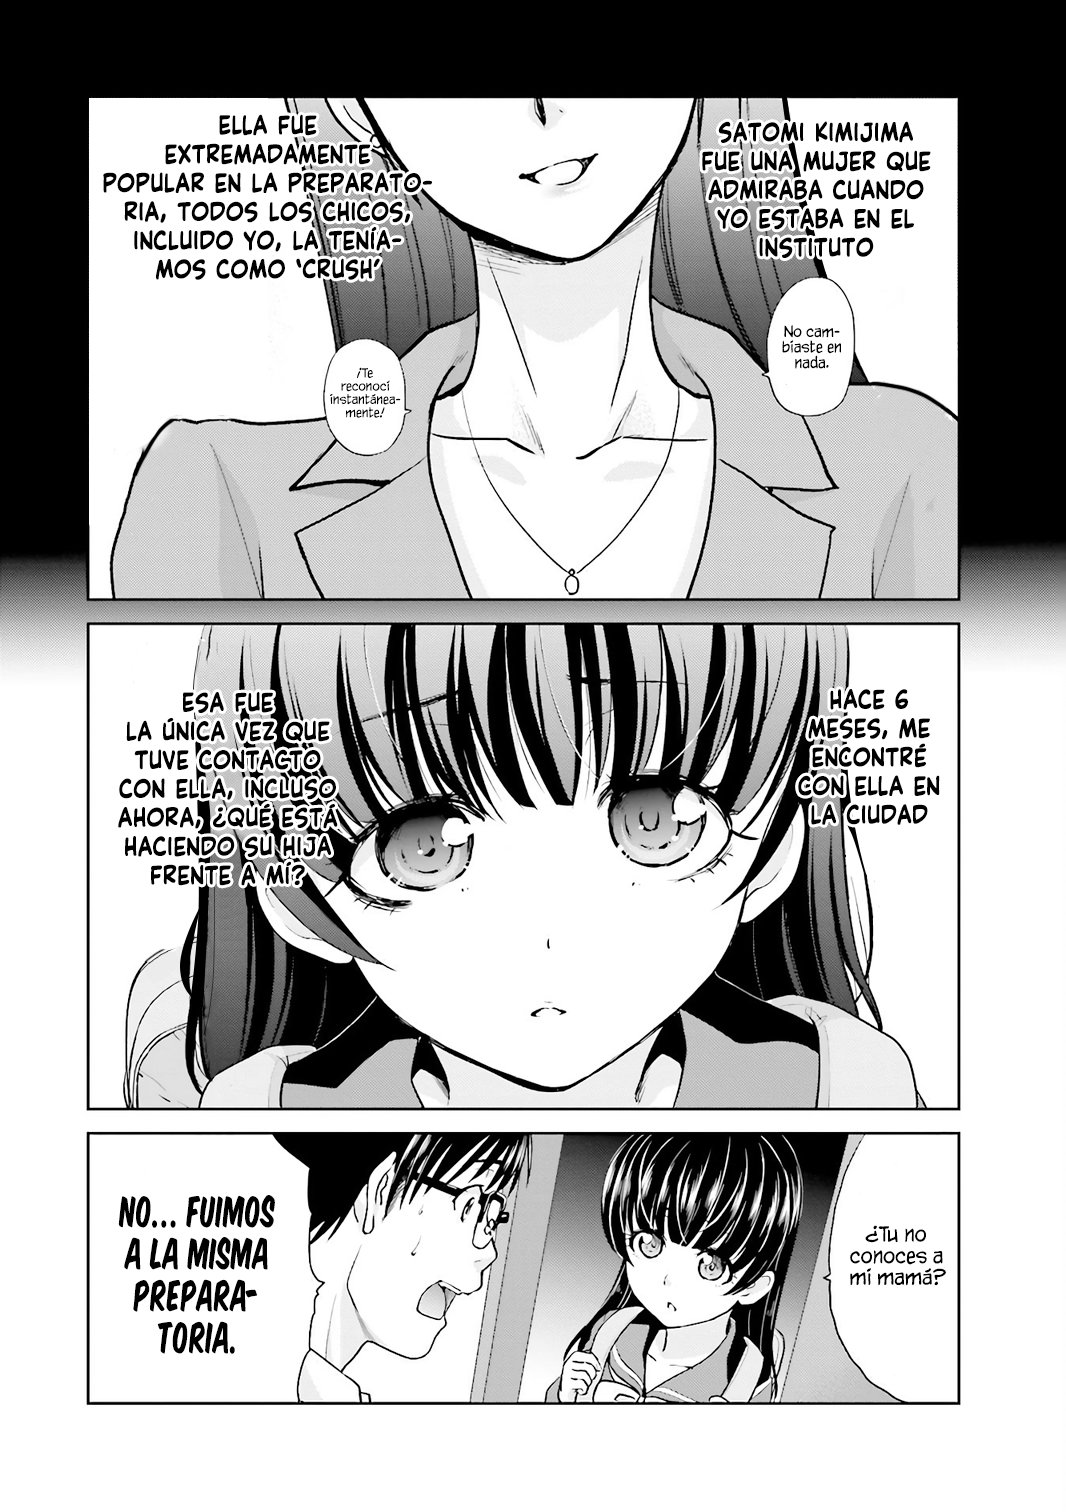 https://nine.mangadogs.com/es_manga/pic8/48/36656/946258/56e3fb541605e047f551bffc5a3dc209.jpg Page 11